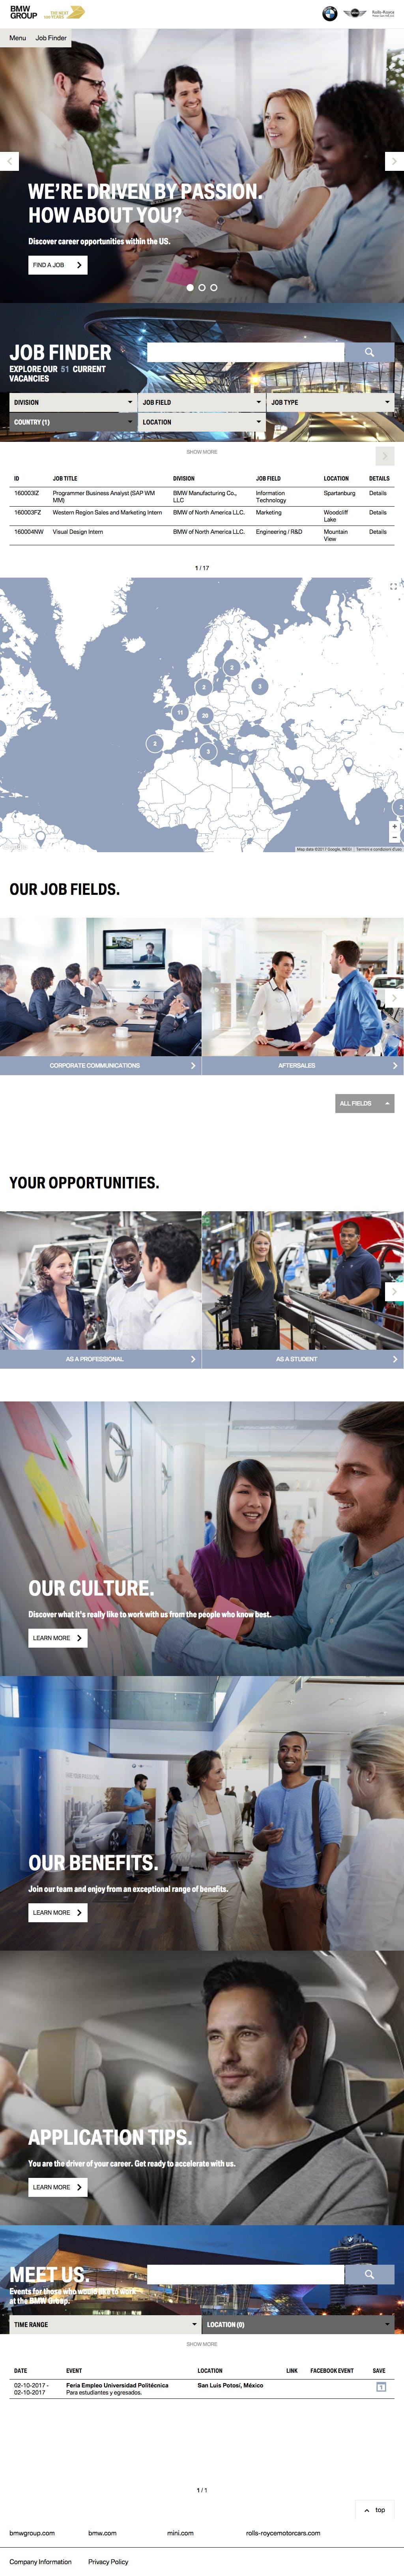 BMW Career Portal Home 1024